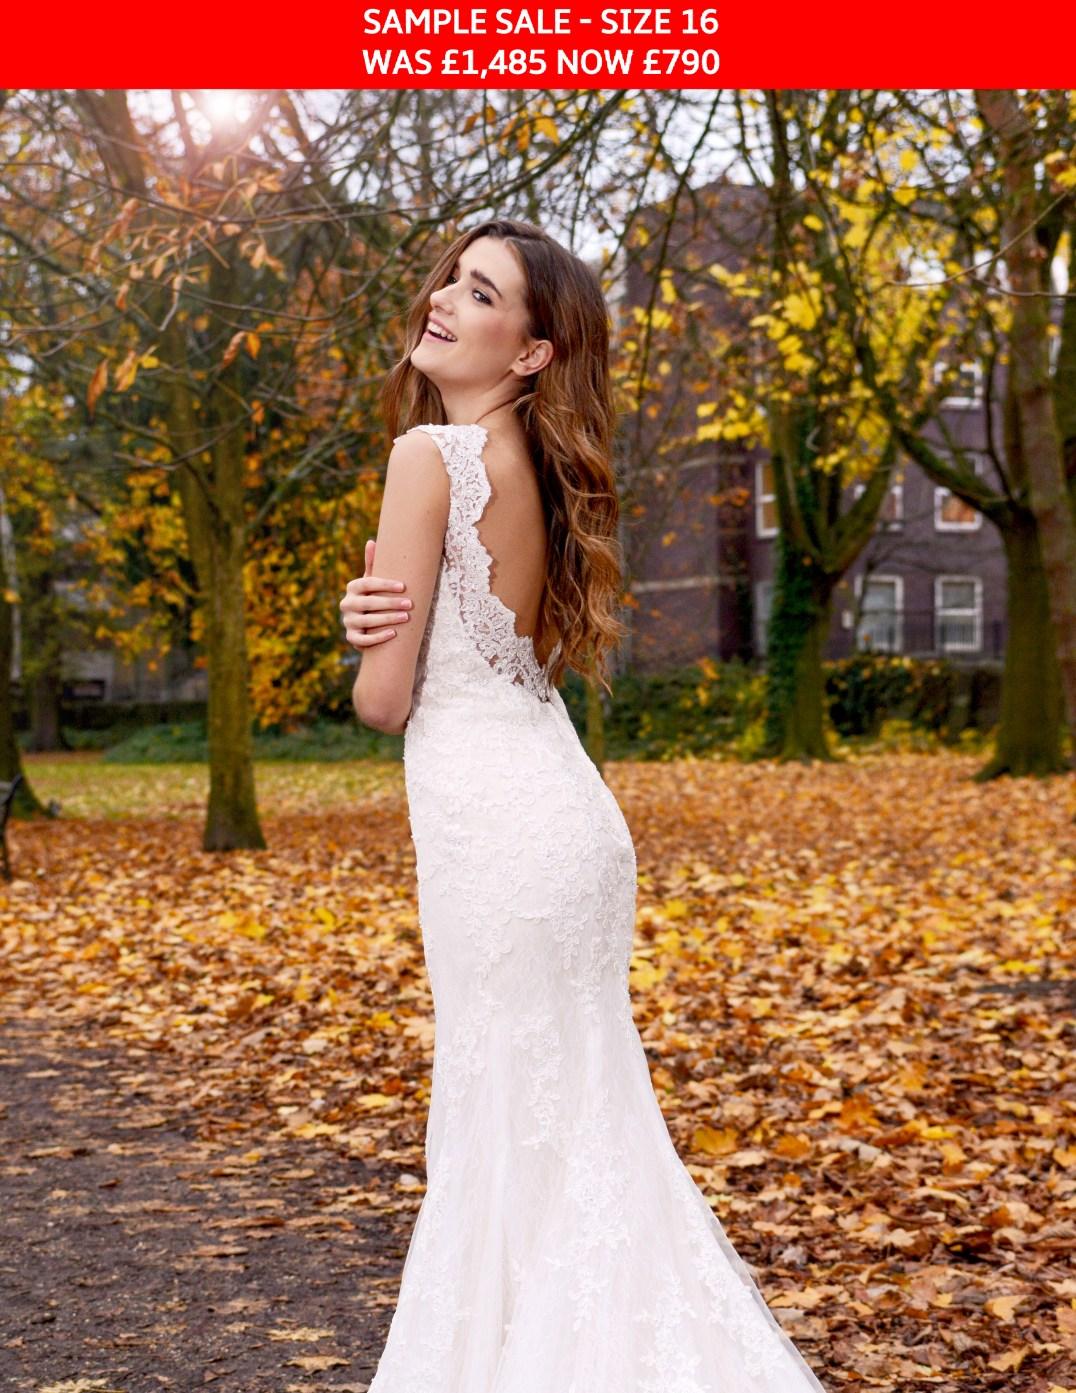 GAIA Cerys wedding gown sample sale